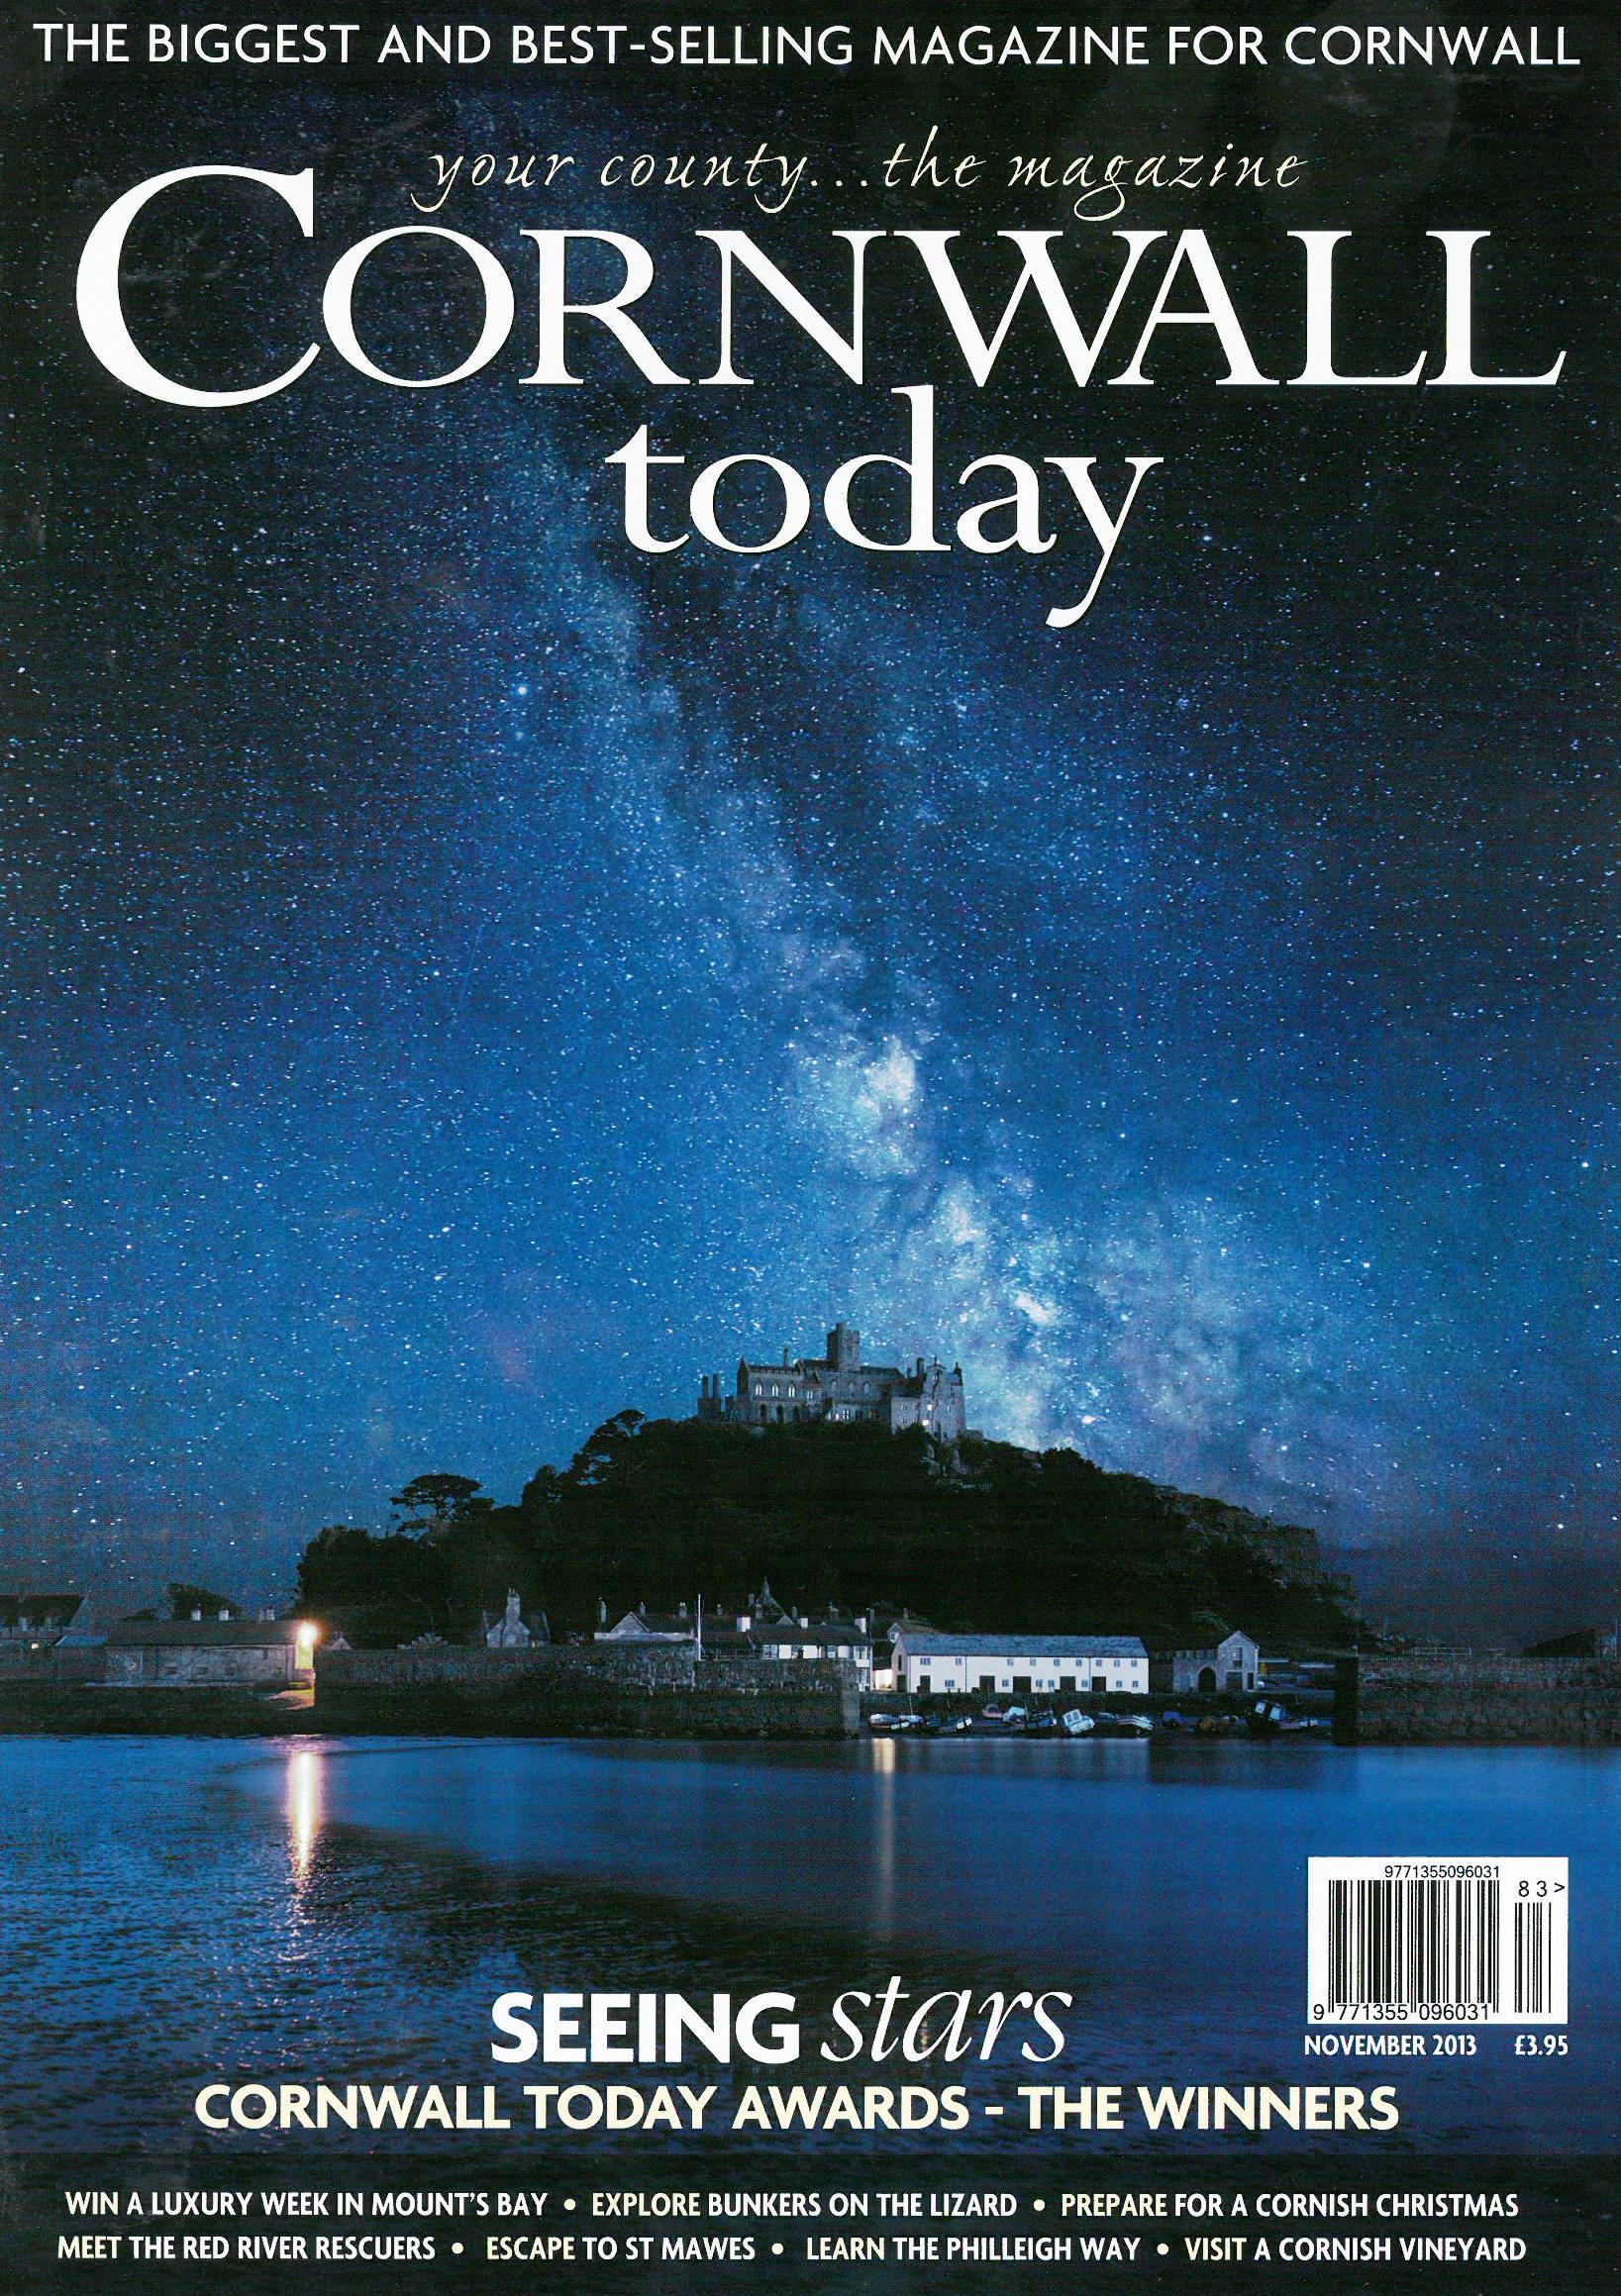 Cornwall Today Nov 13 - St Mawes Retreats